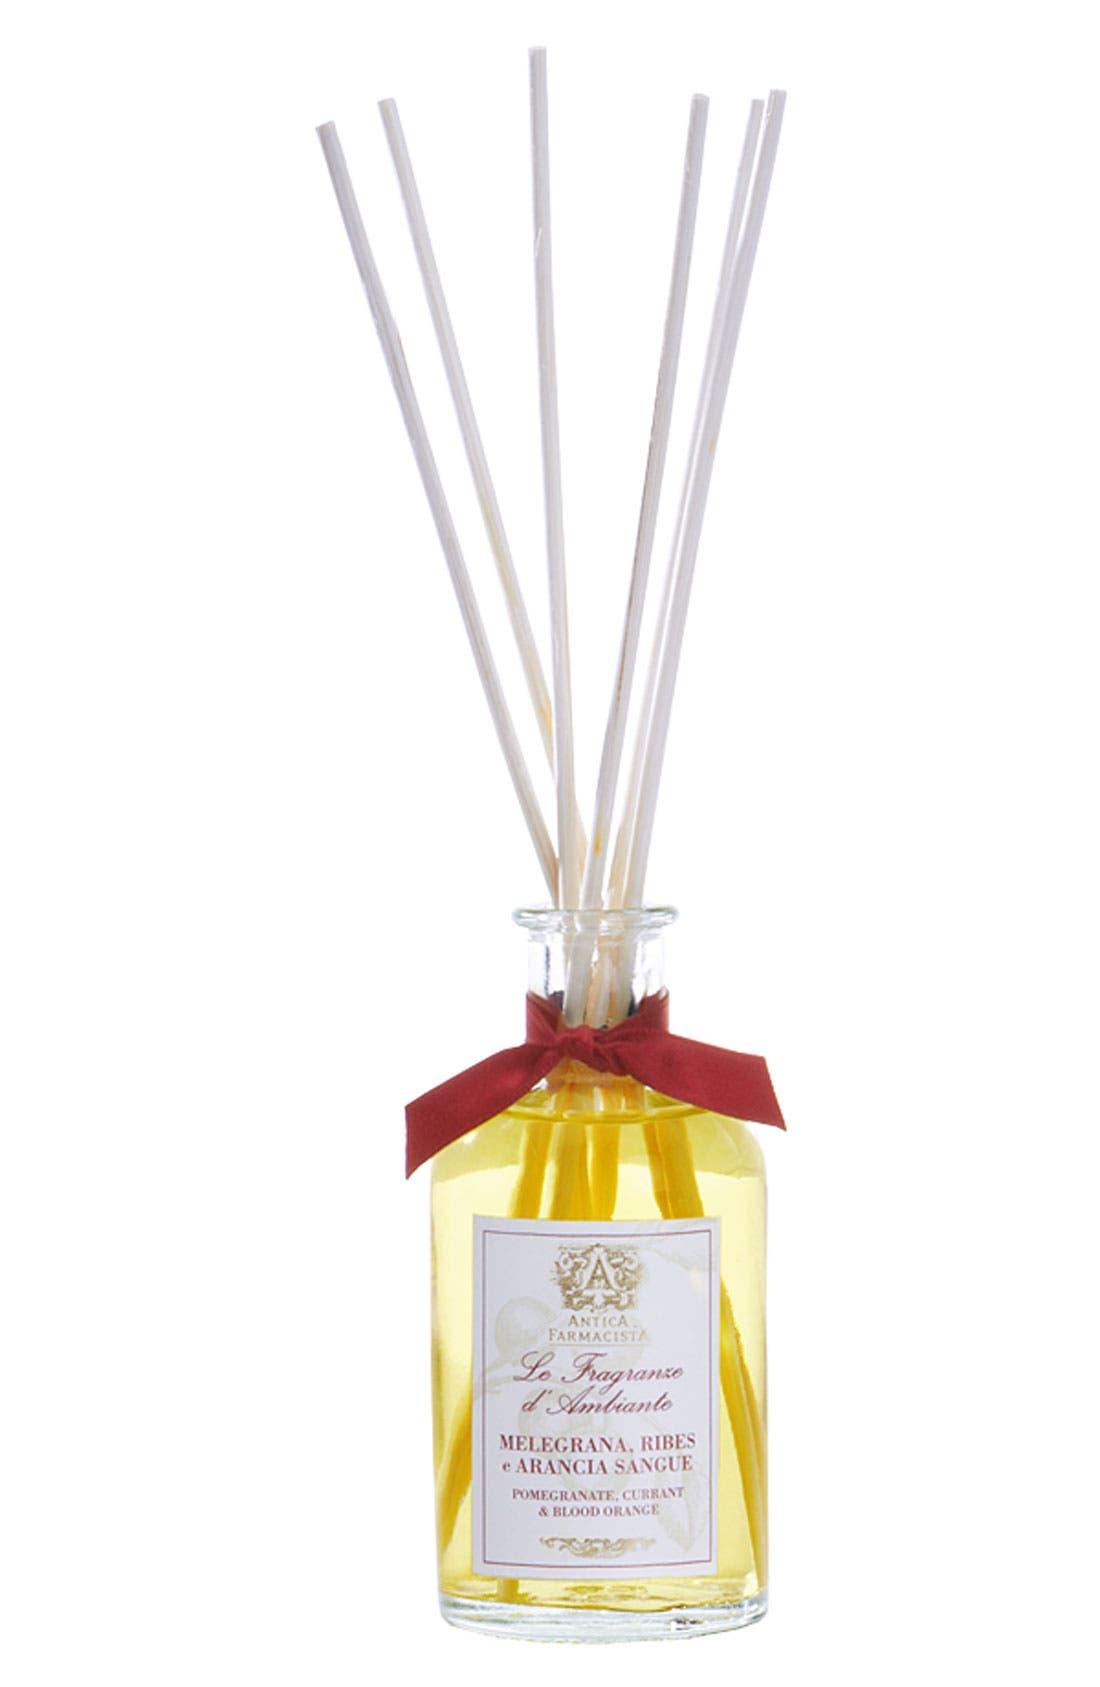 Alternate Image 1 Selected - Antica Farmacista Pomegranate, Currant & Blood Orange Home Ambiance Perfume (3.3 oz.)